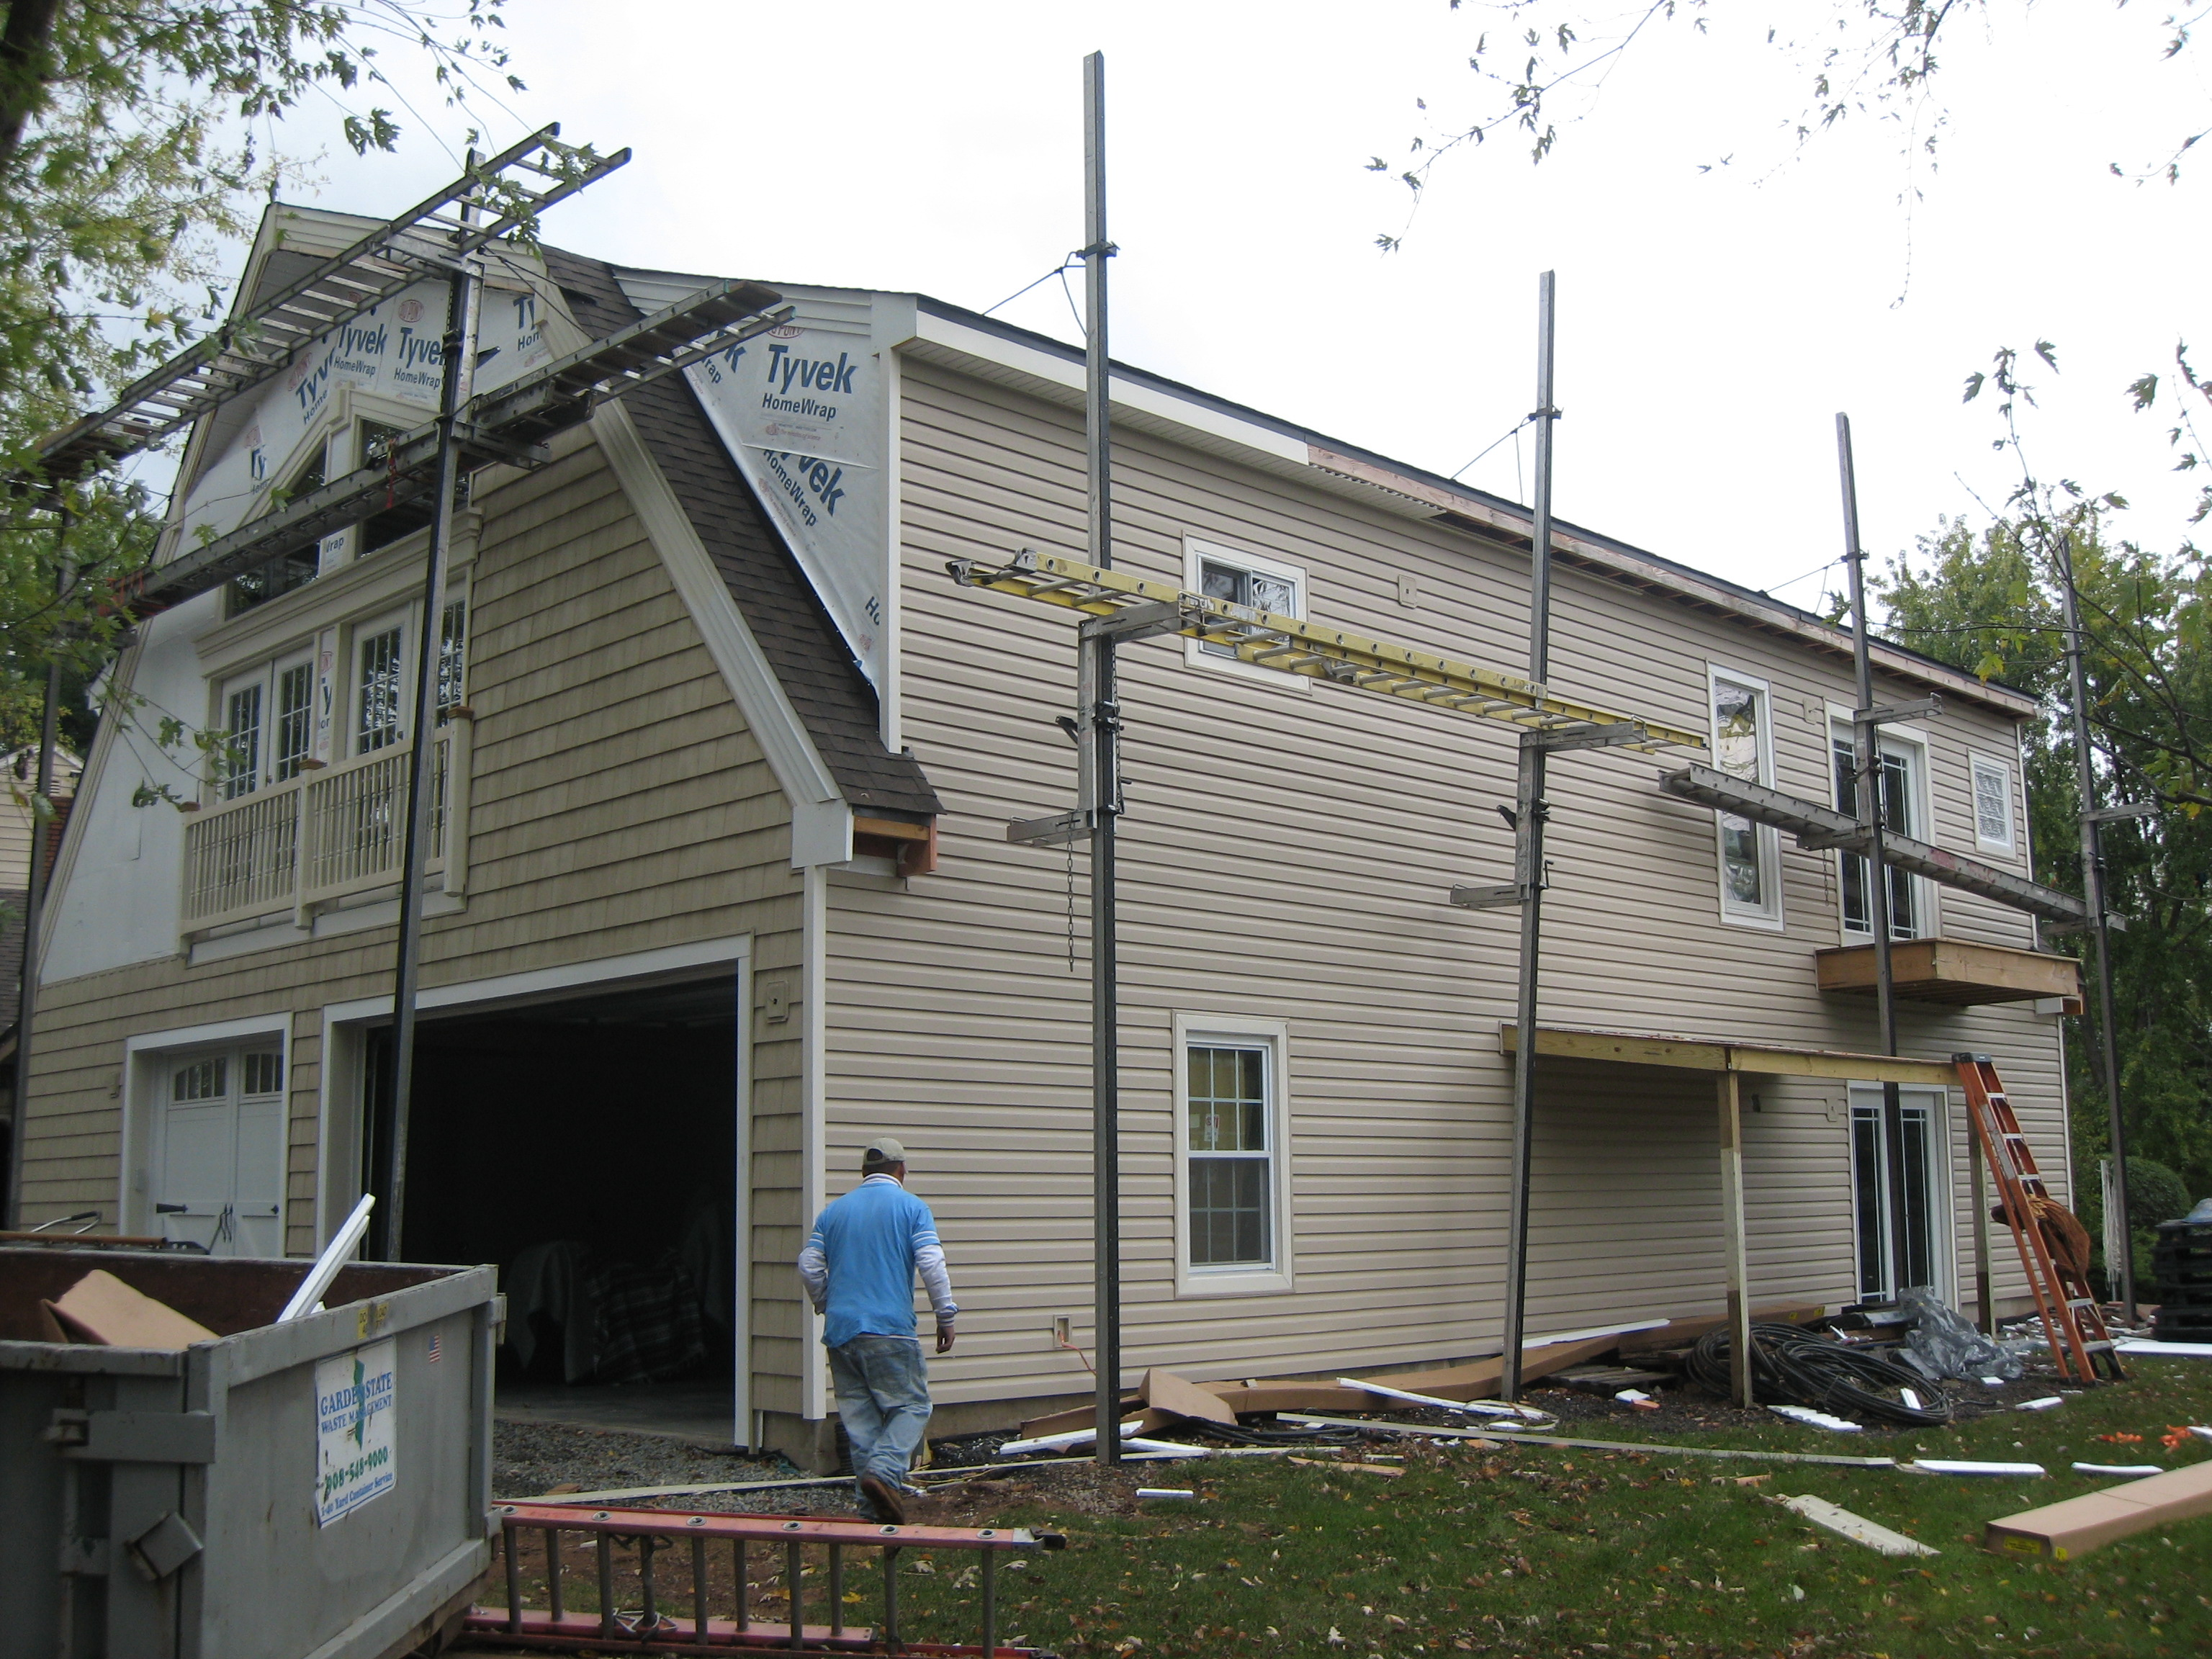 Vinyl Cedar Shake Siding Nj Affordable Roofing Contractors